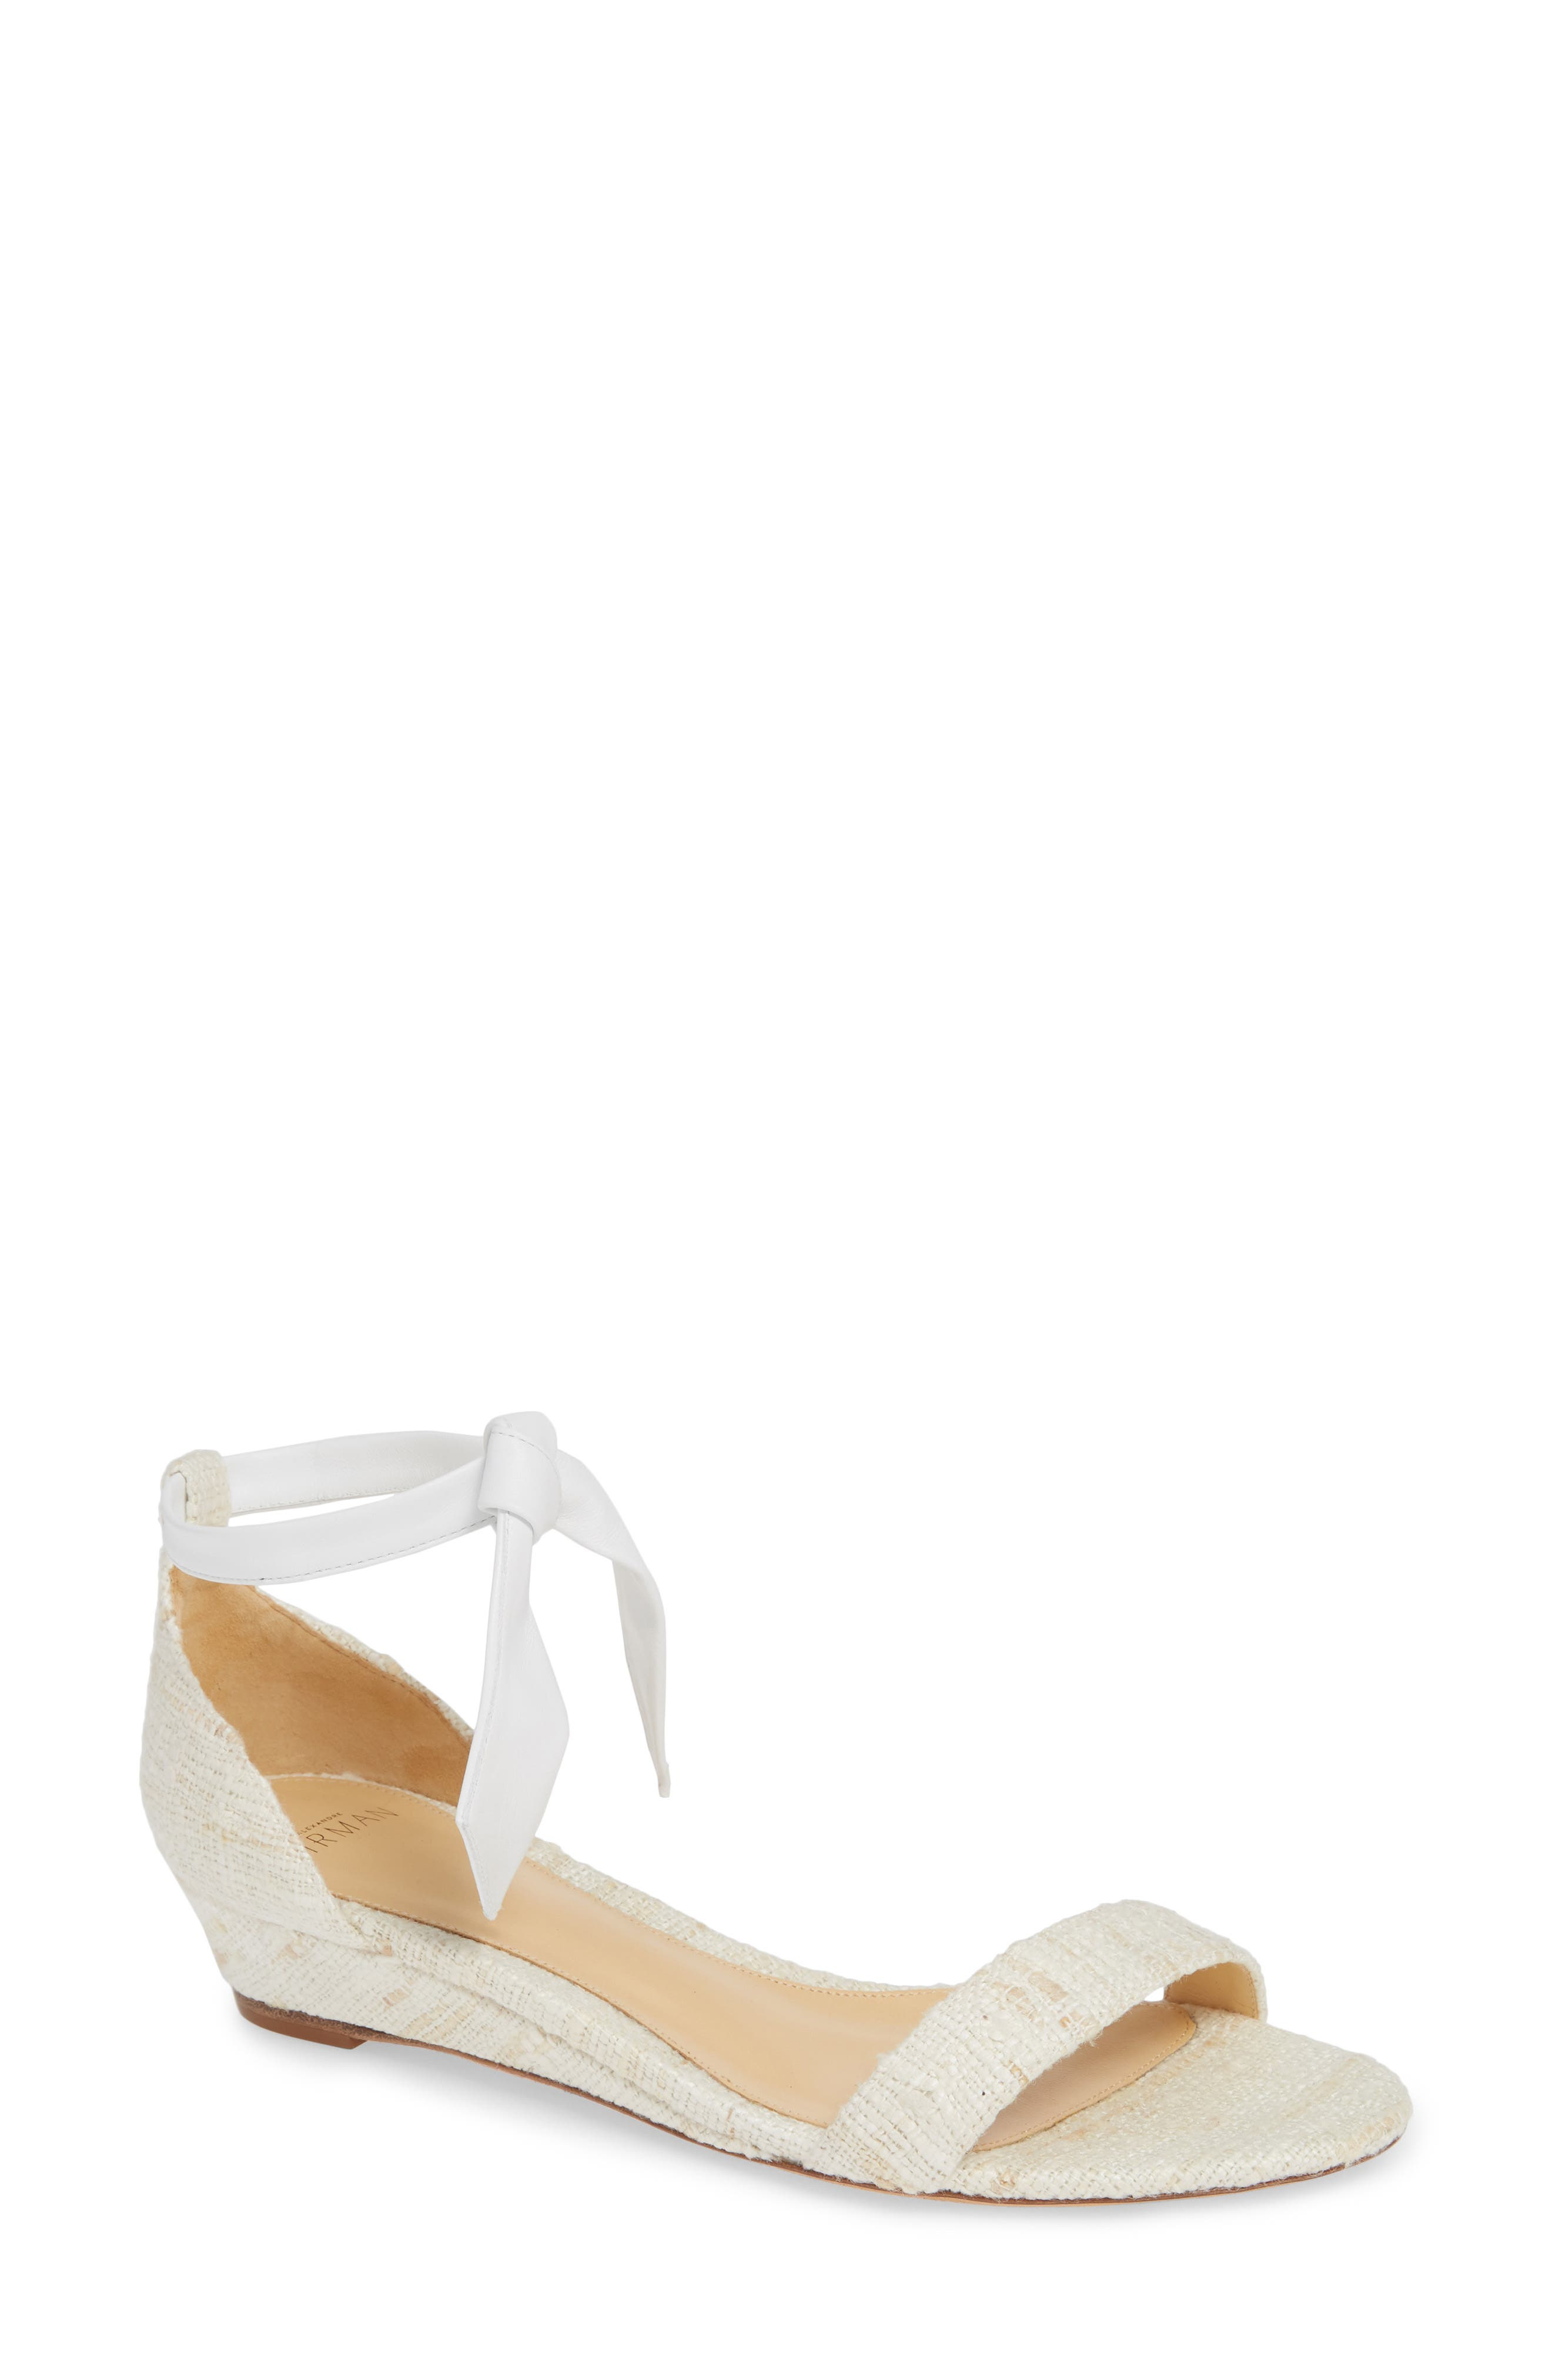 Alexandre Birman Clarita Wedge Sandal, White